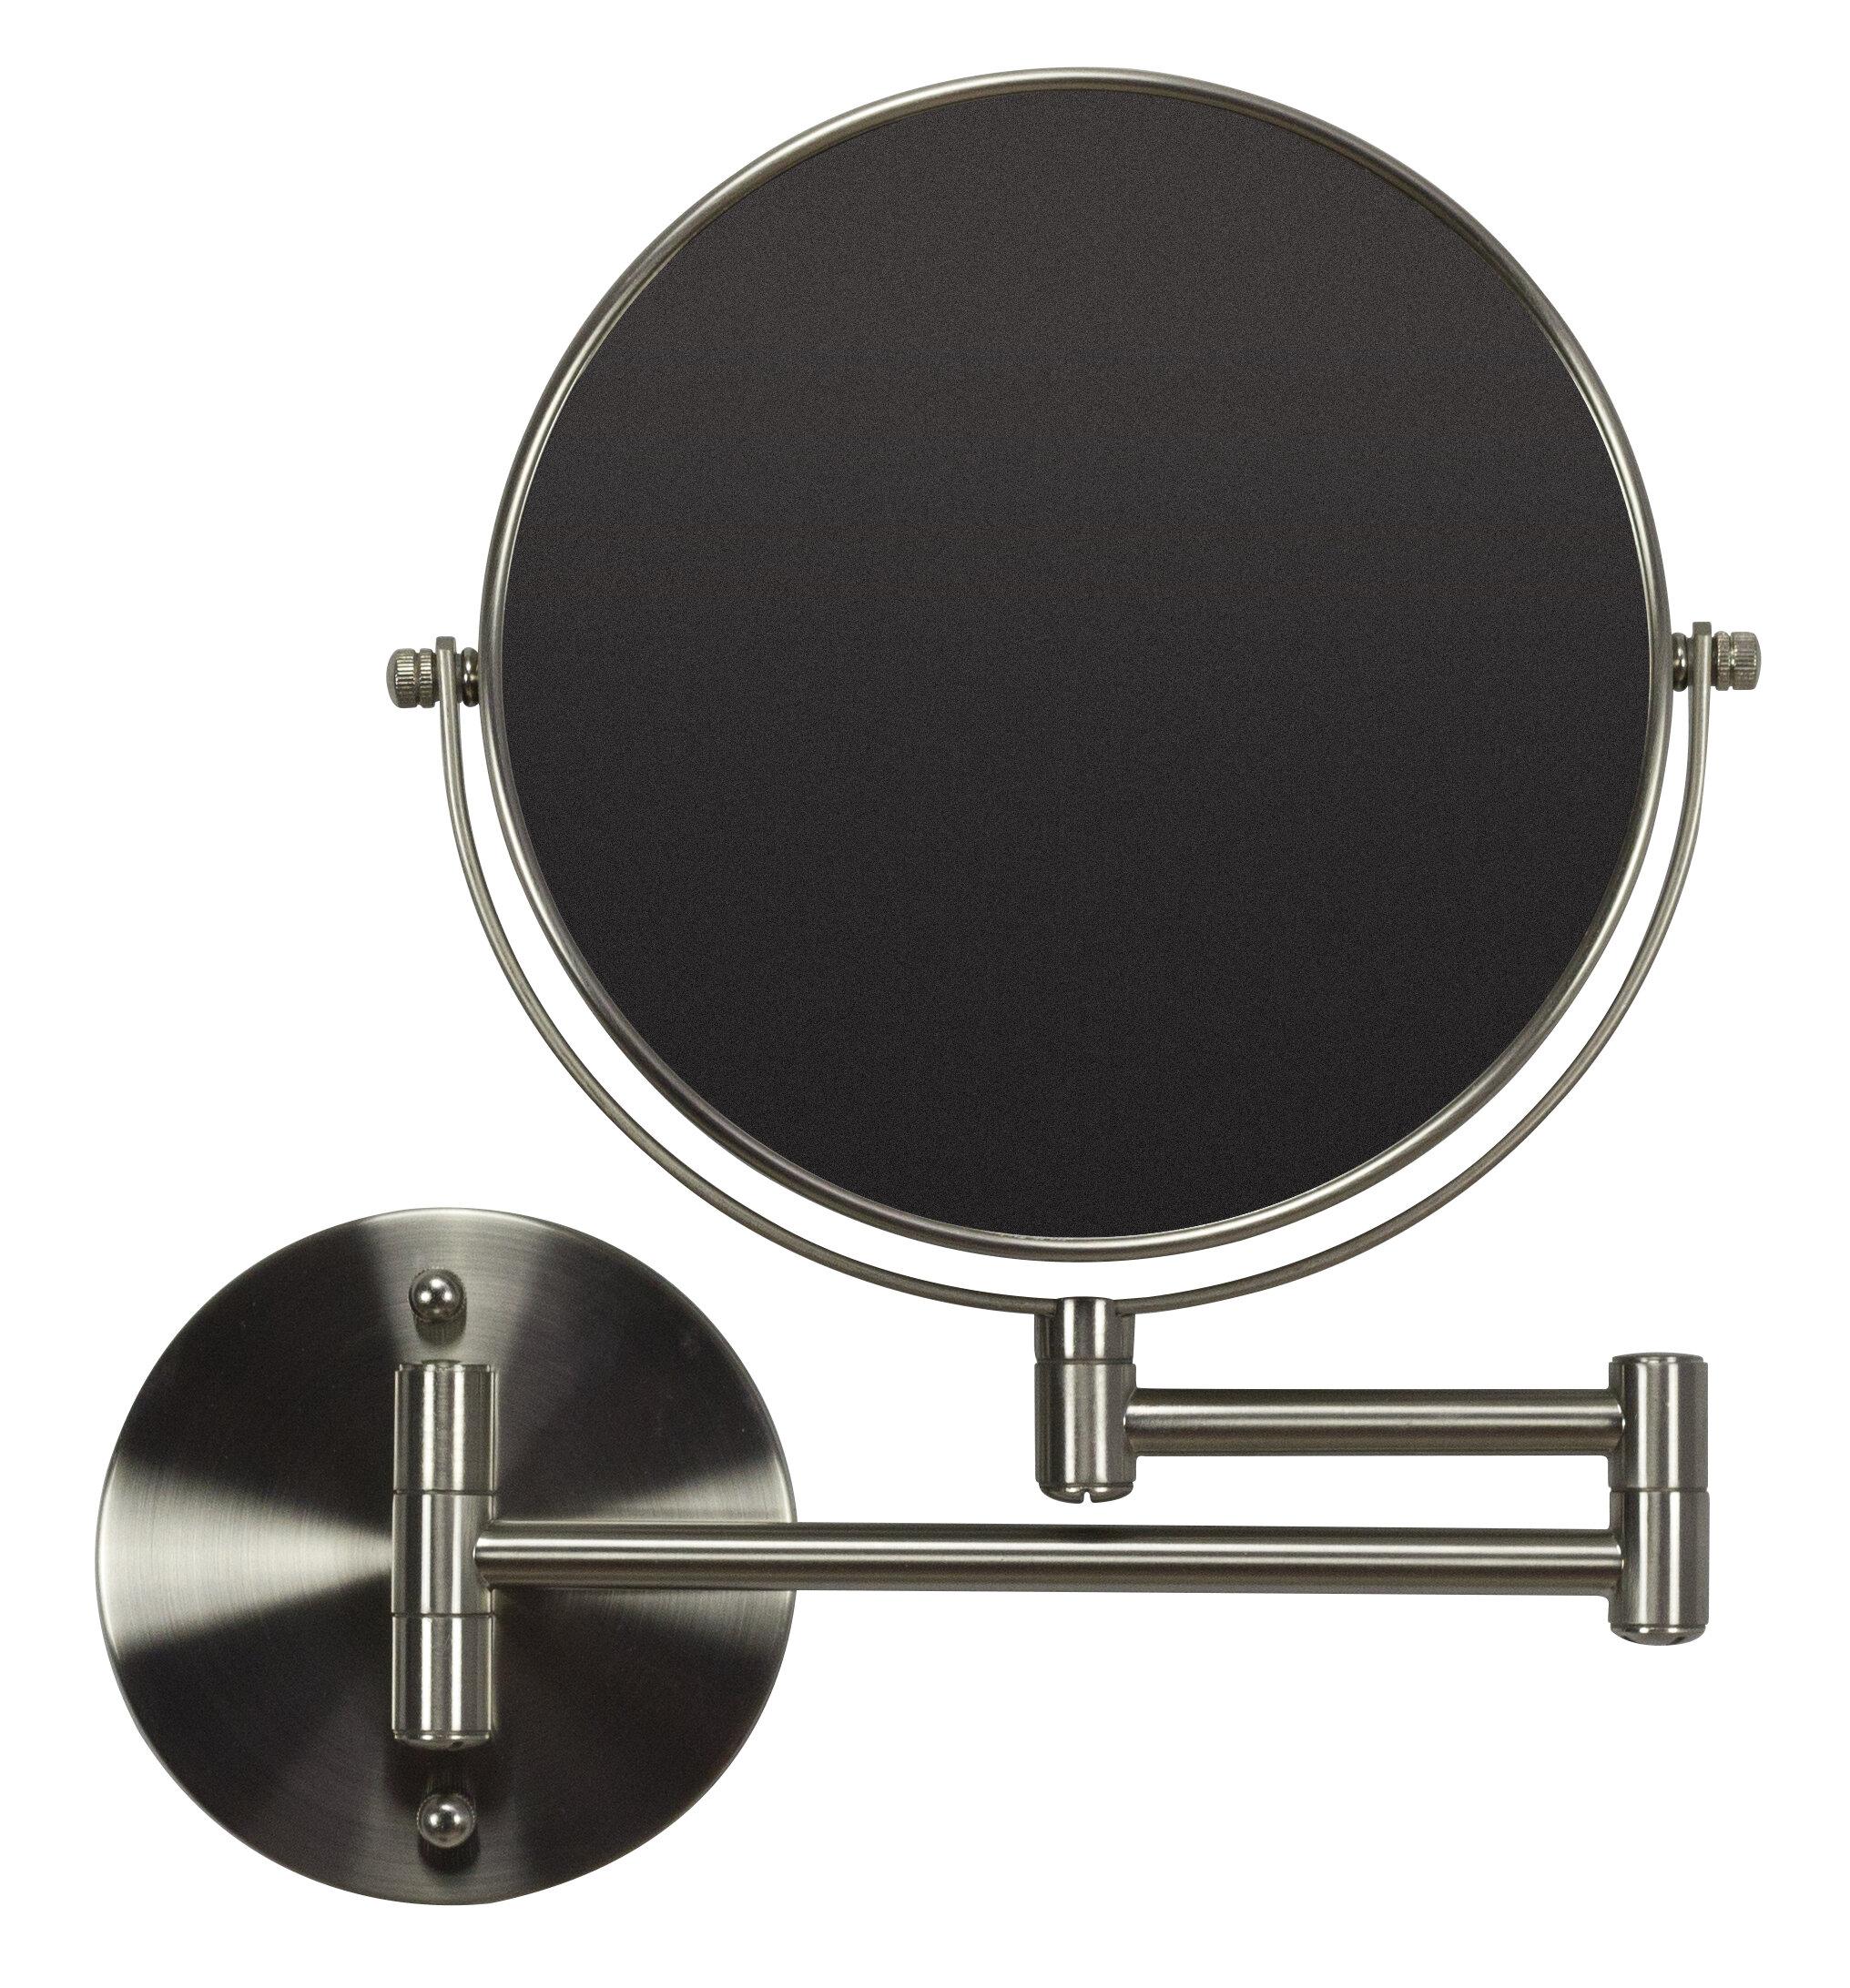 Royalpurplebathkitchen Boonville Round Br Mirror Wall Mount Magnifying Vanity Wayfair